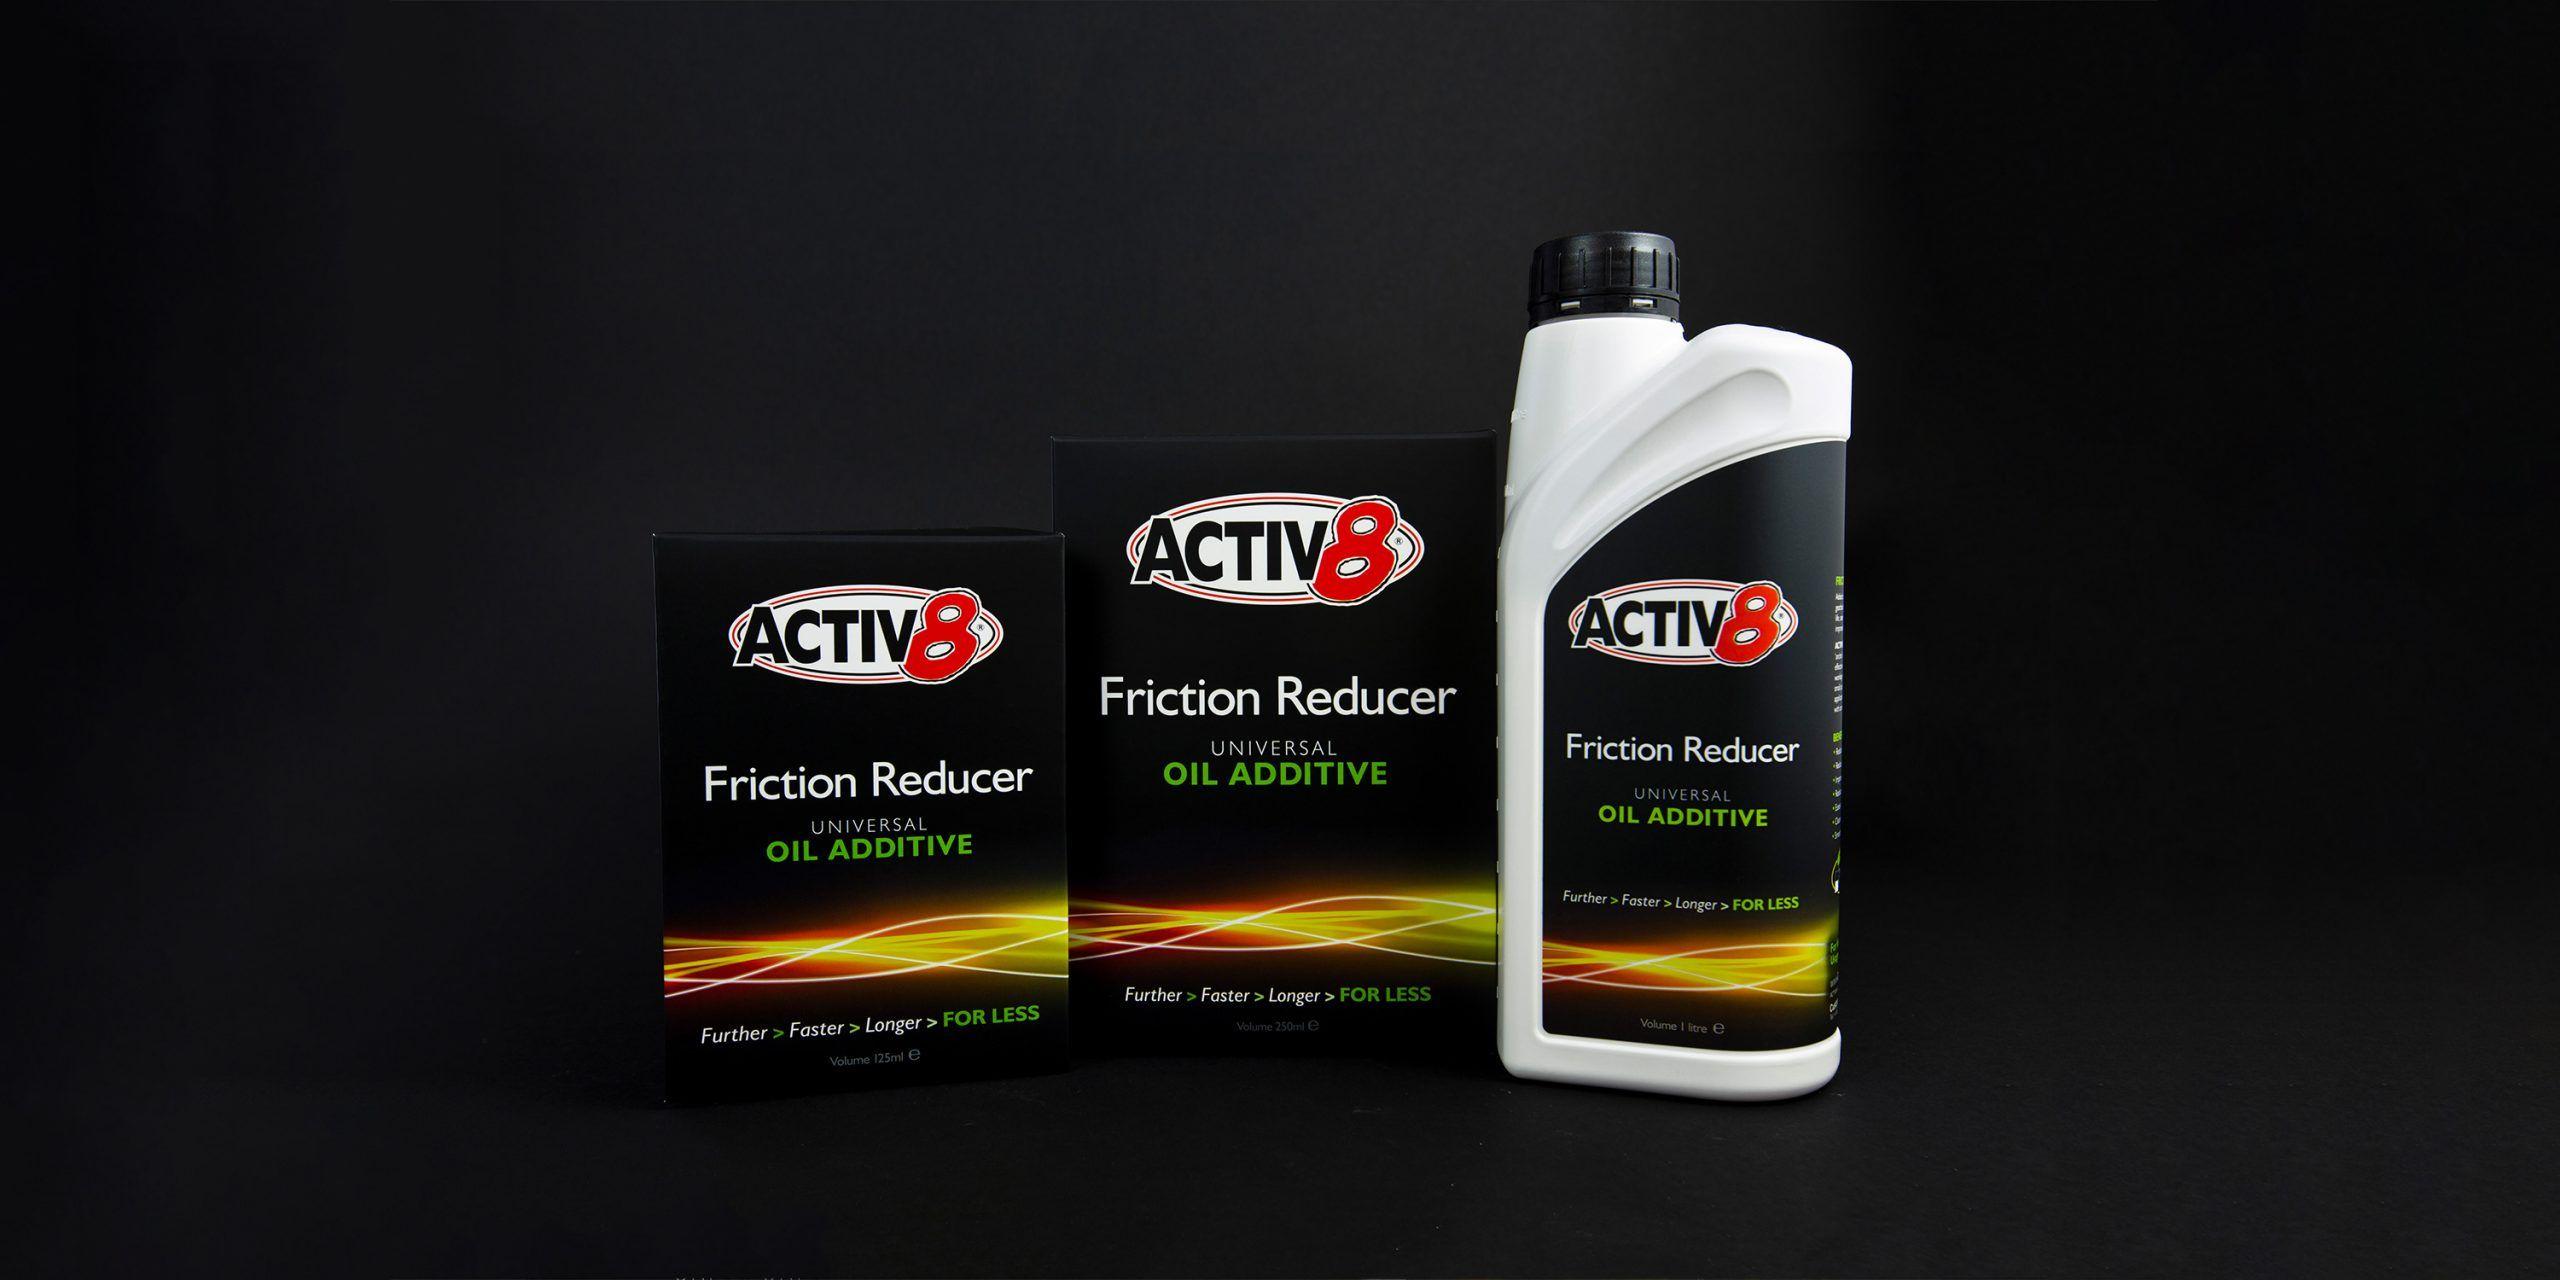 Activ8 Product shots